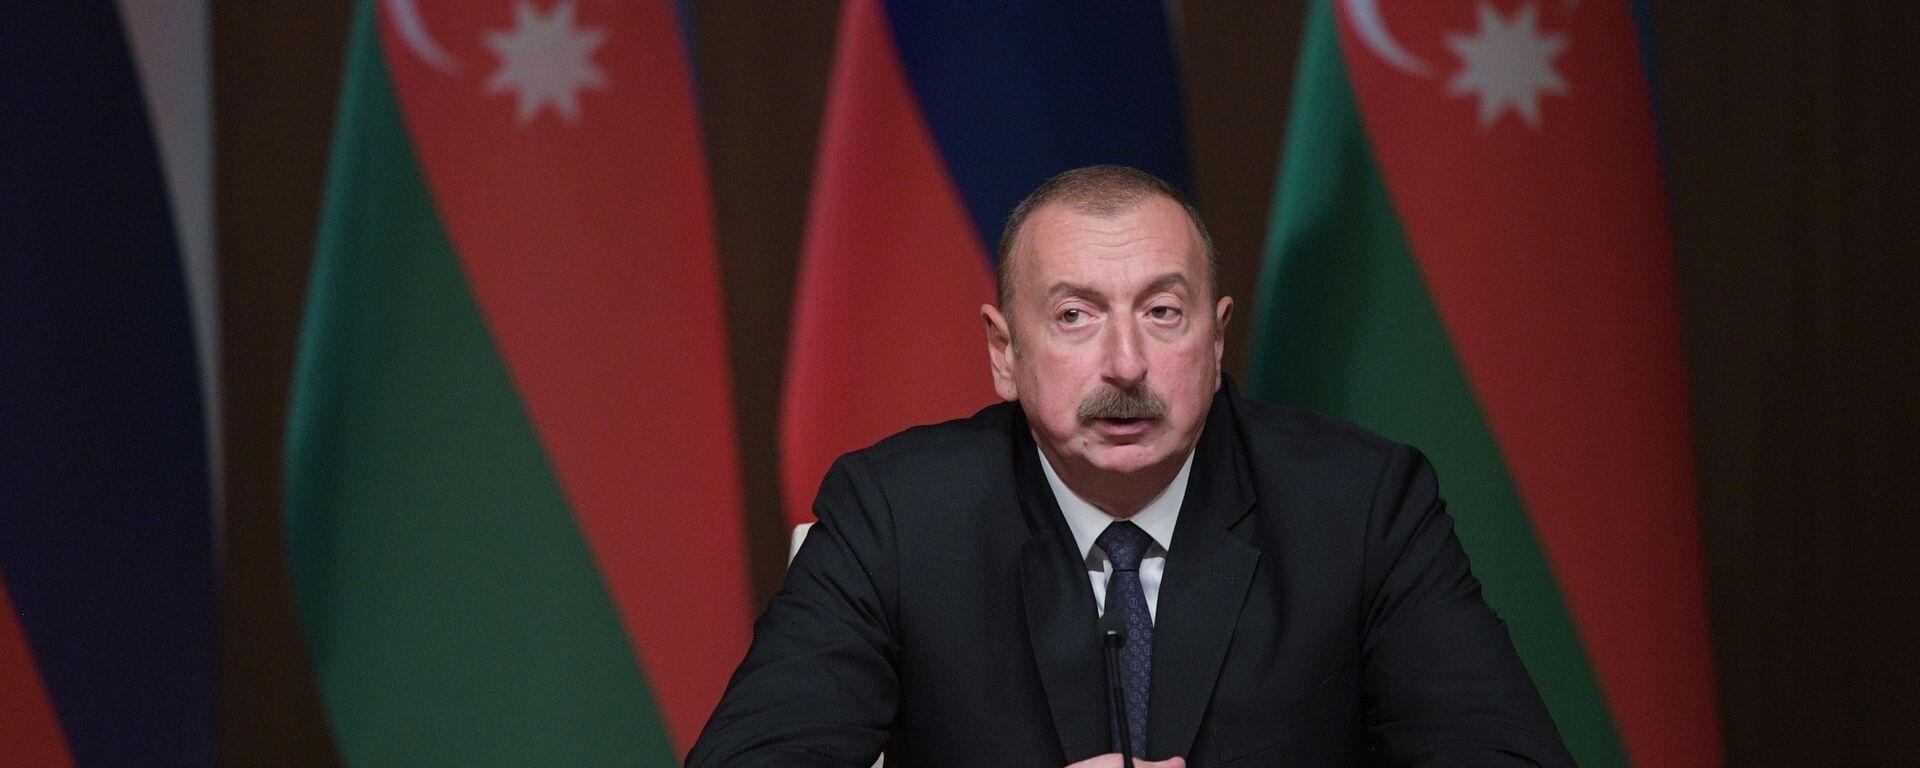 Il presidente azerbaigiano Ilham Aliyev - Sputnik Italia, 1920, 13.04.2021